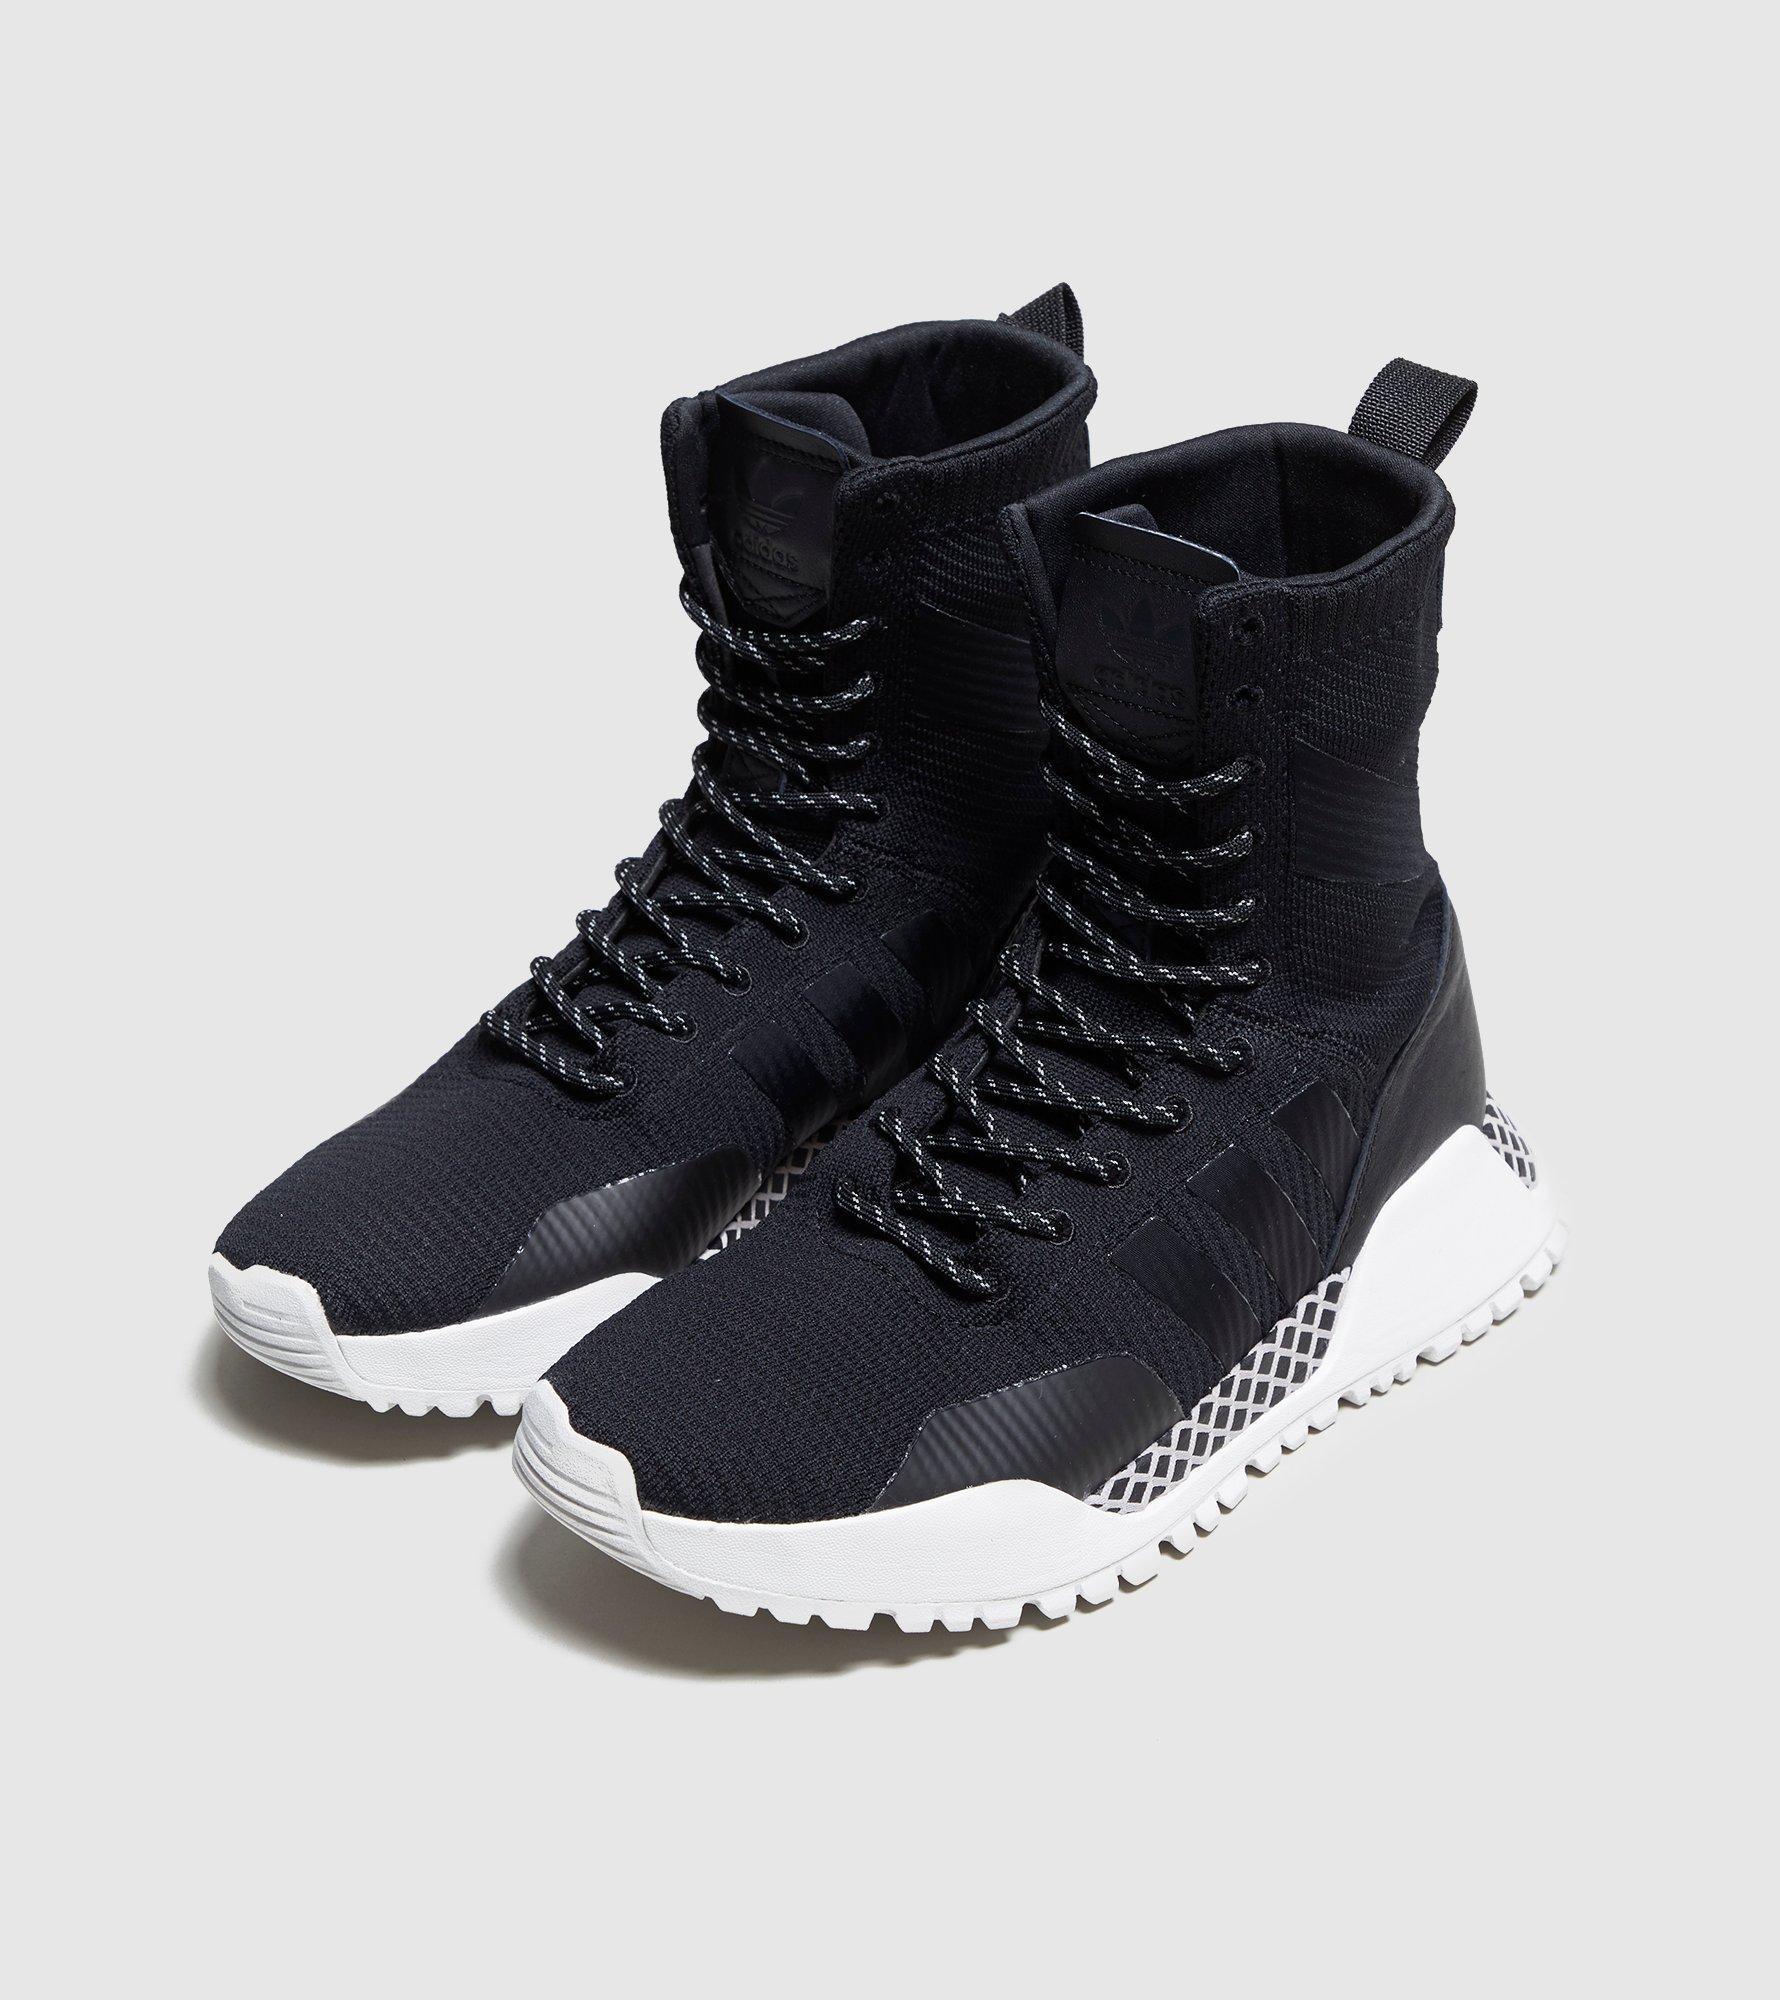 best service 1dd1f b48db Lyst - adidas Originals A.f 1.3 Primeknit Boot in Black for